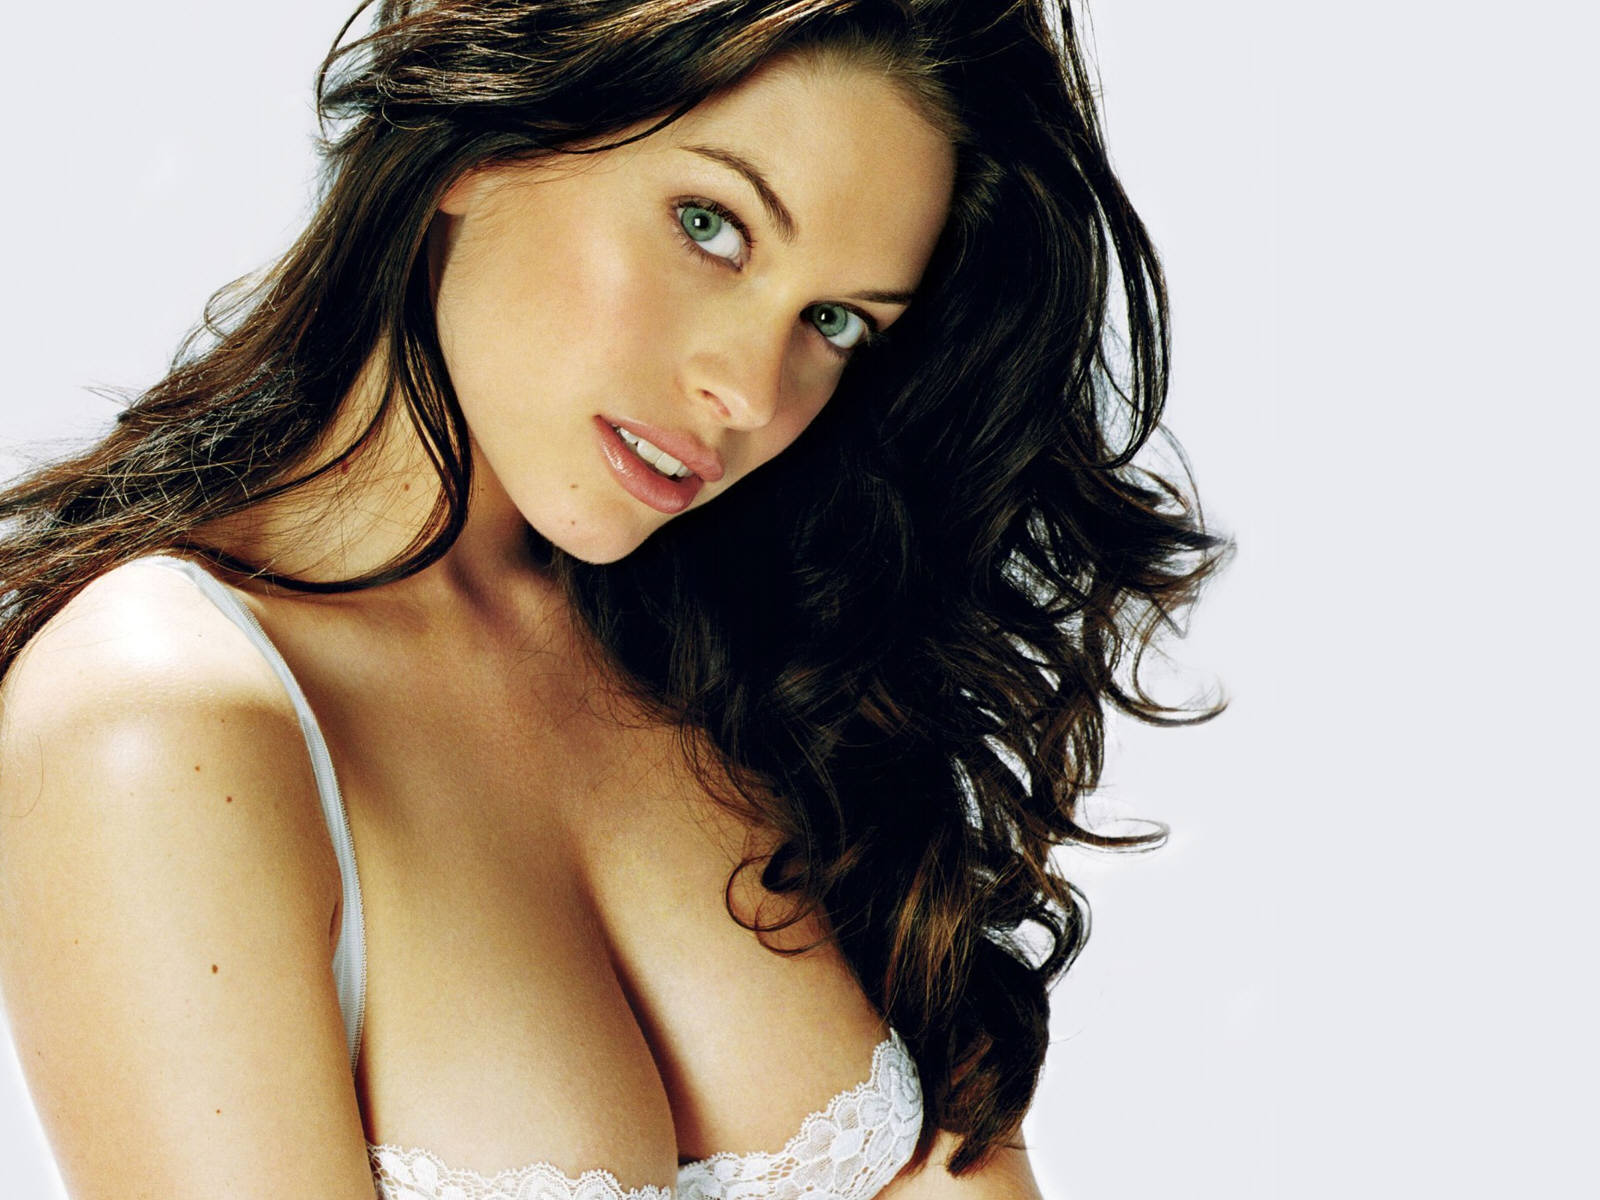 http://4.bp.blogspot.com/-HovreiDf_J4/UQt9oMG5h2I/AAAAAAAACXY/S3qLPB3_kIA/s1600/Hot-Celebrity-Wallpaper-Kim-Smith%252Bsexy.jpg